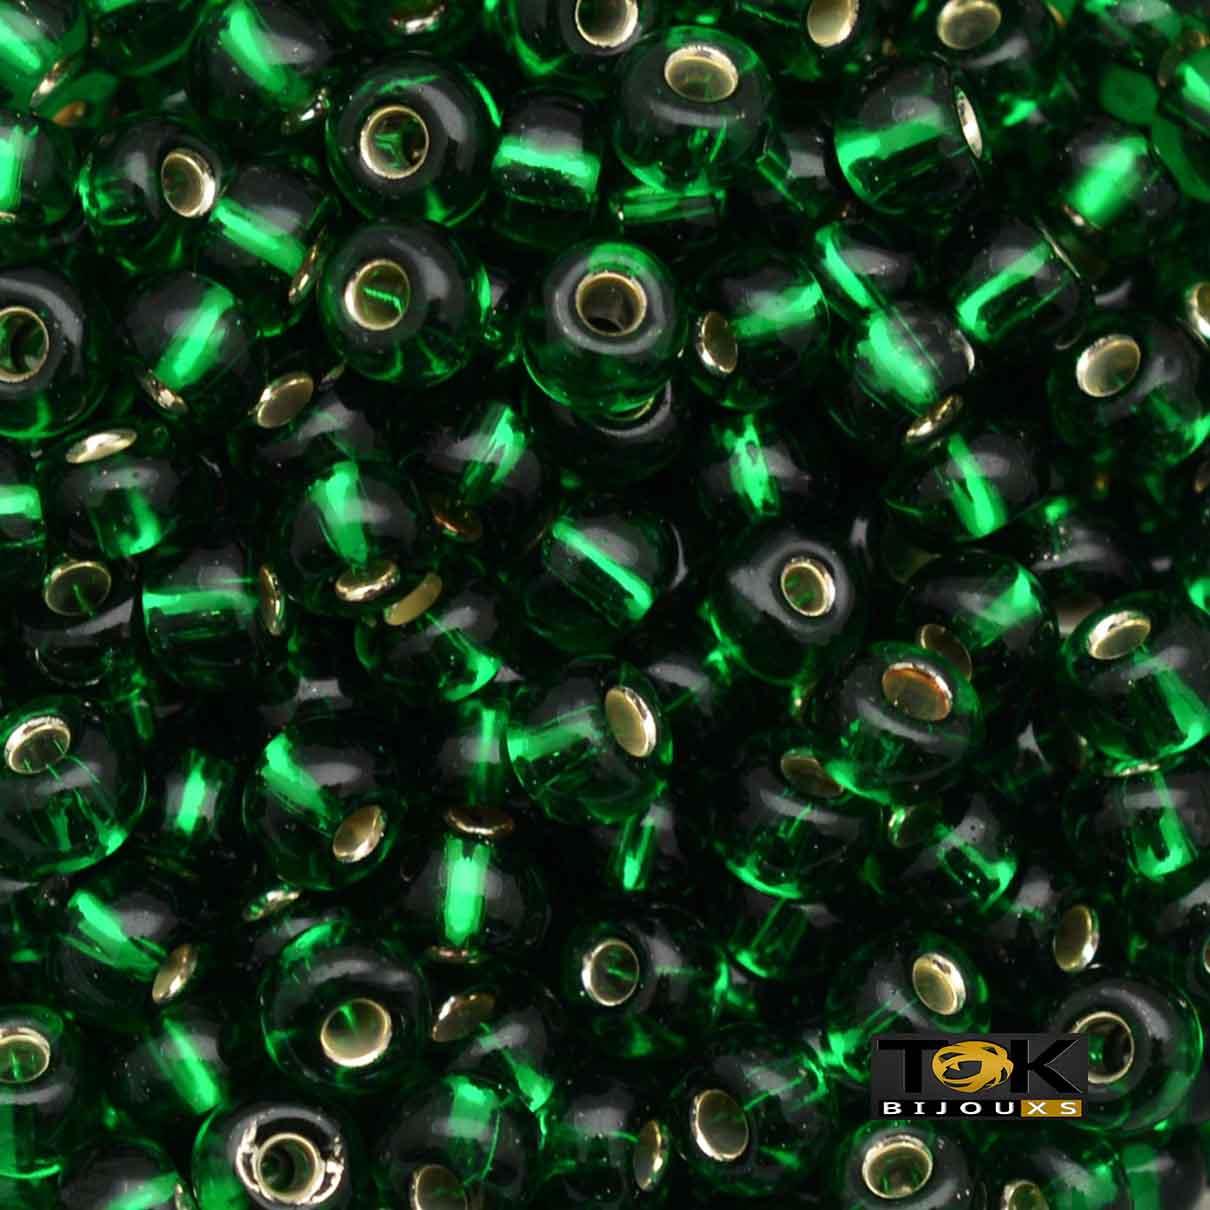 Missanguinha Jablonex - Verde Band Transparente - 500g